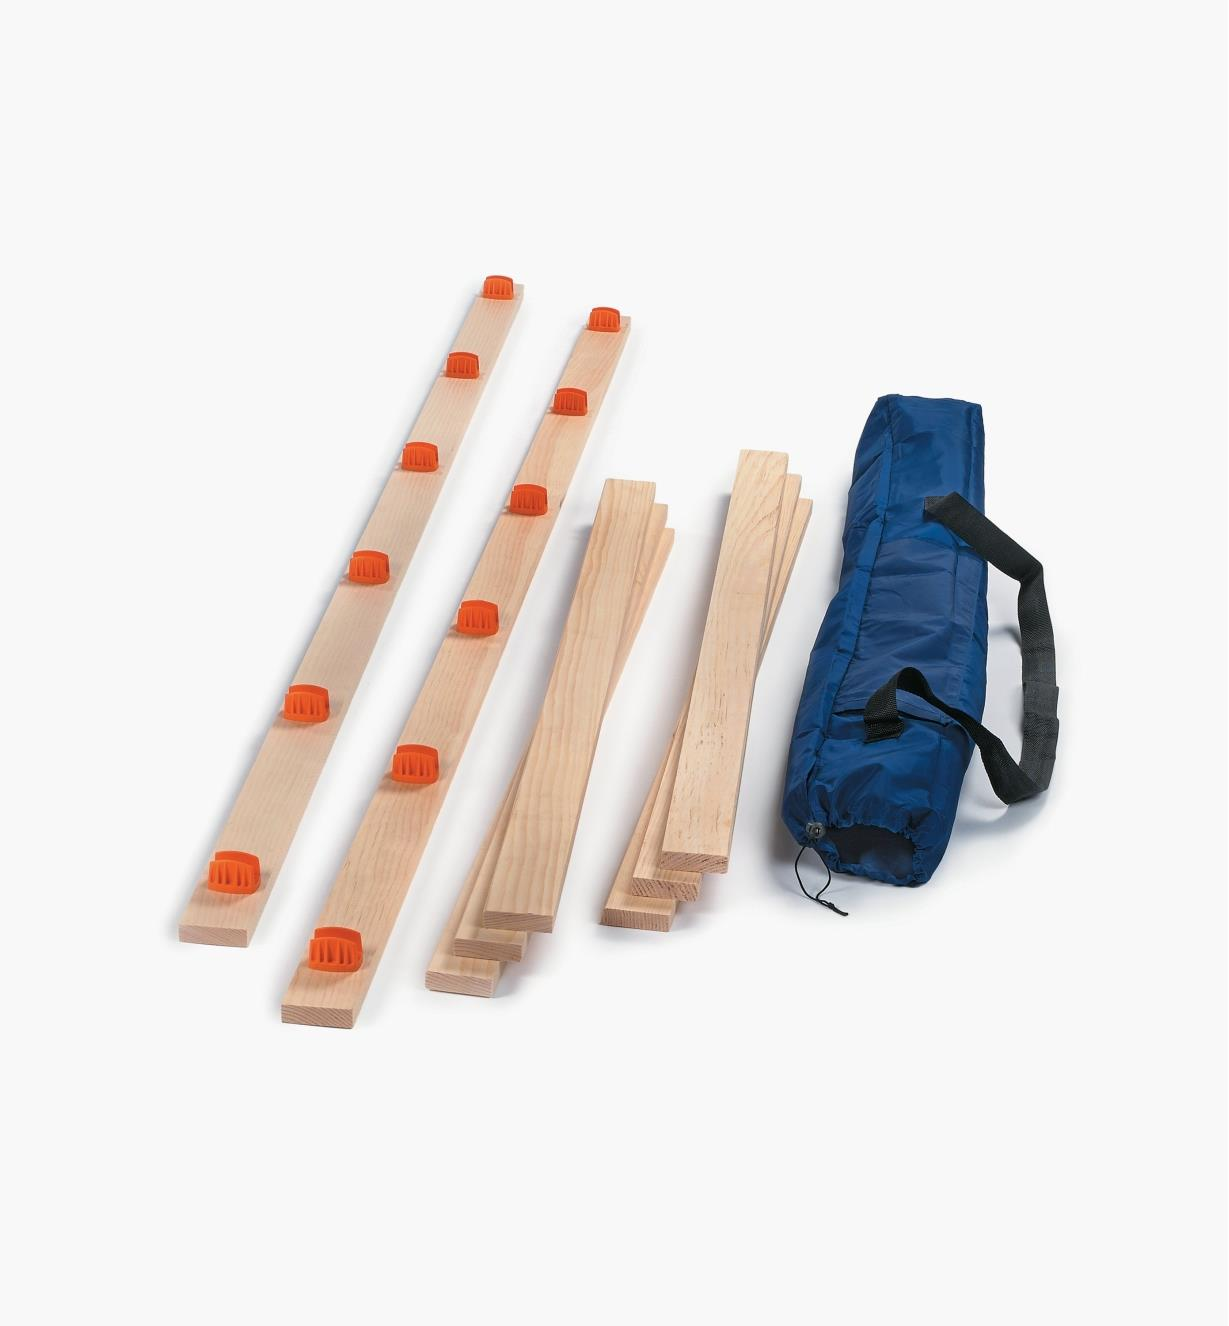 05H4107 - Veritas Panel Platform Kit with Wood